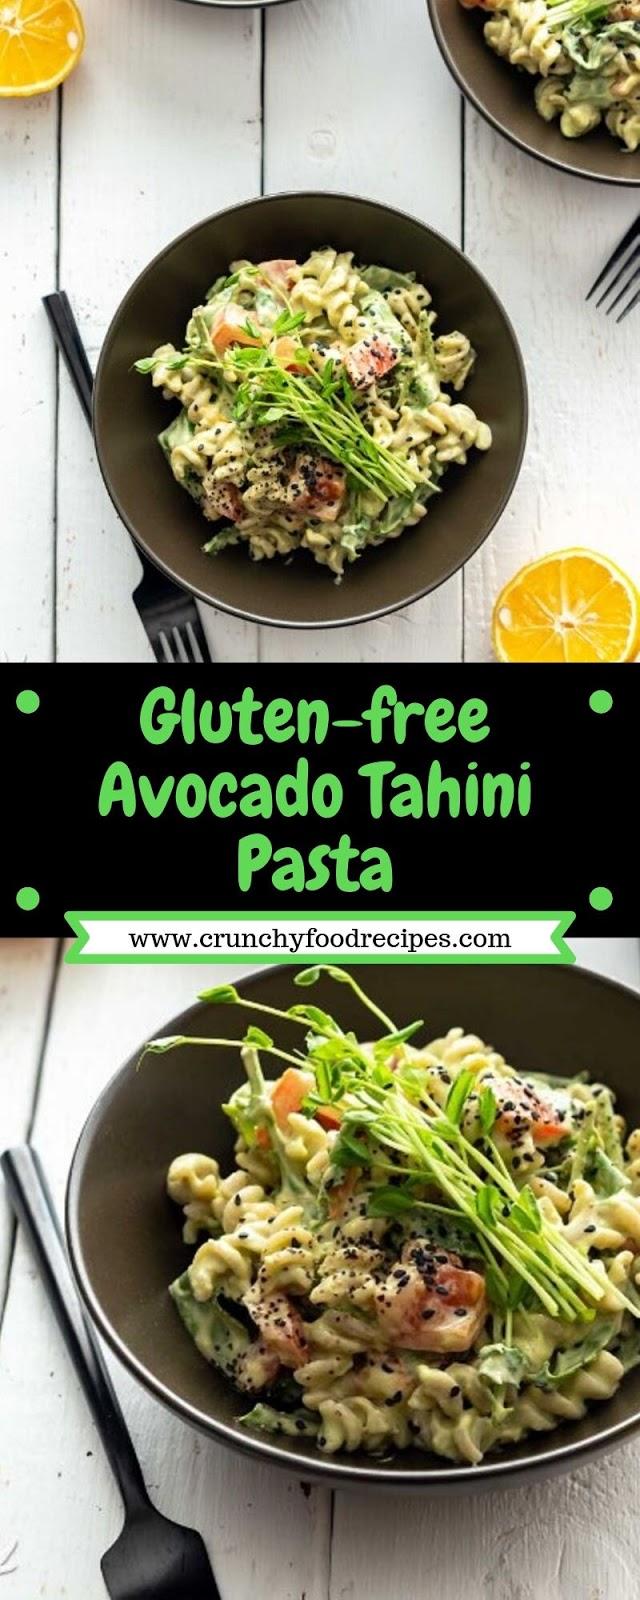 Gluten-free Avocado Tahini Pasta